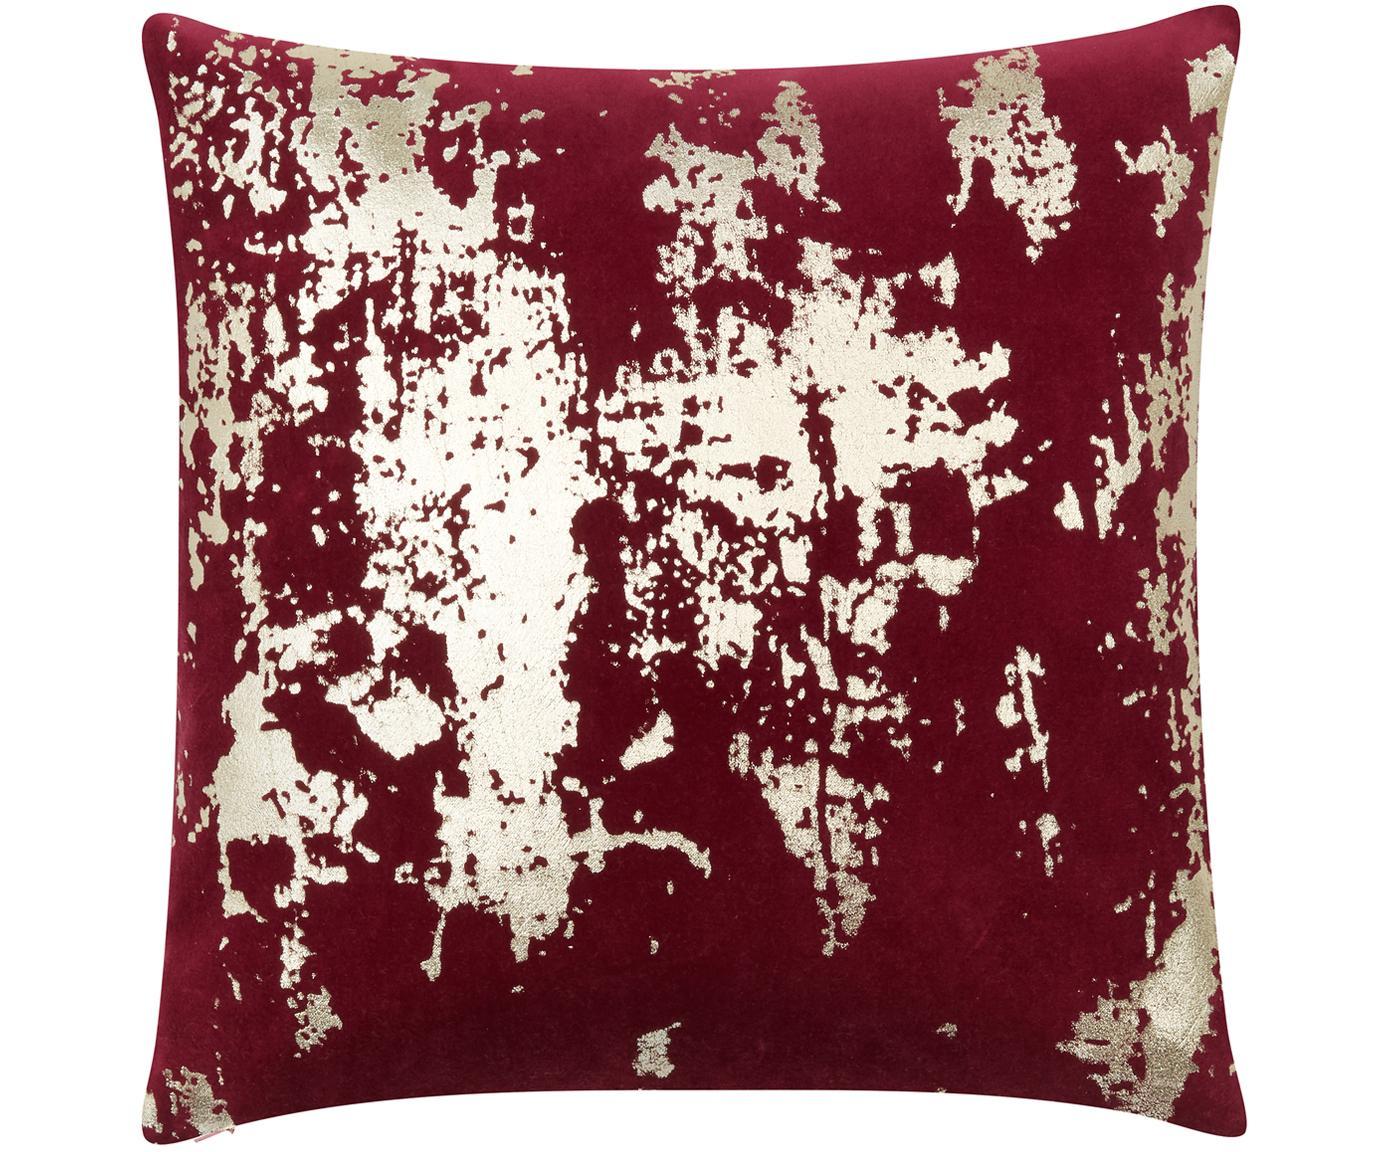 Funda de cojín de terciopeloShiny, estilo vintage, Terciopelo de algodón, Rojo, dorado, An 40 x L 40 cm